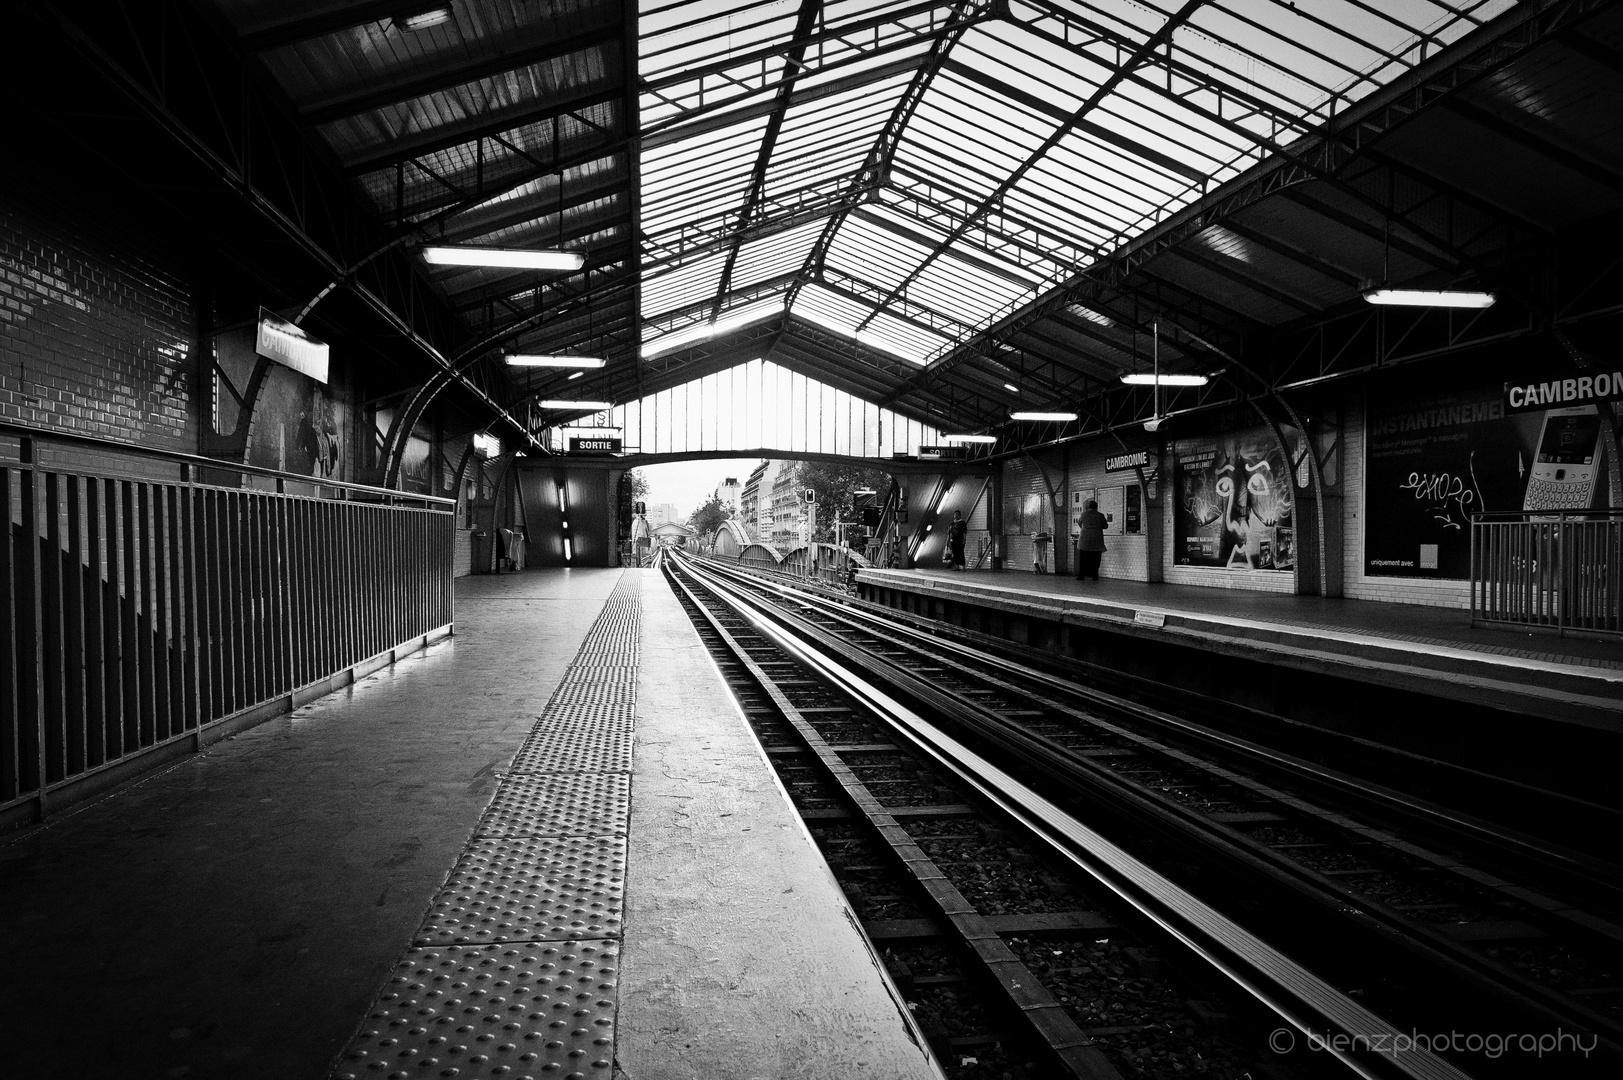 Metrostation in Paris